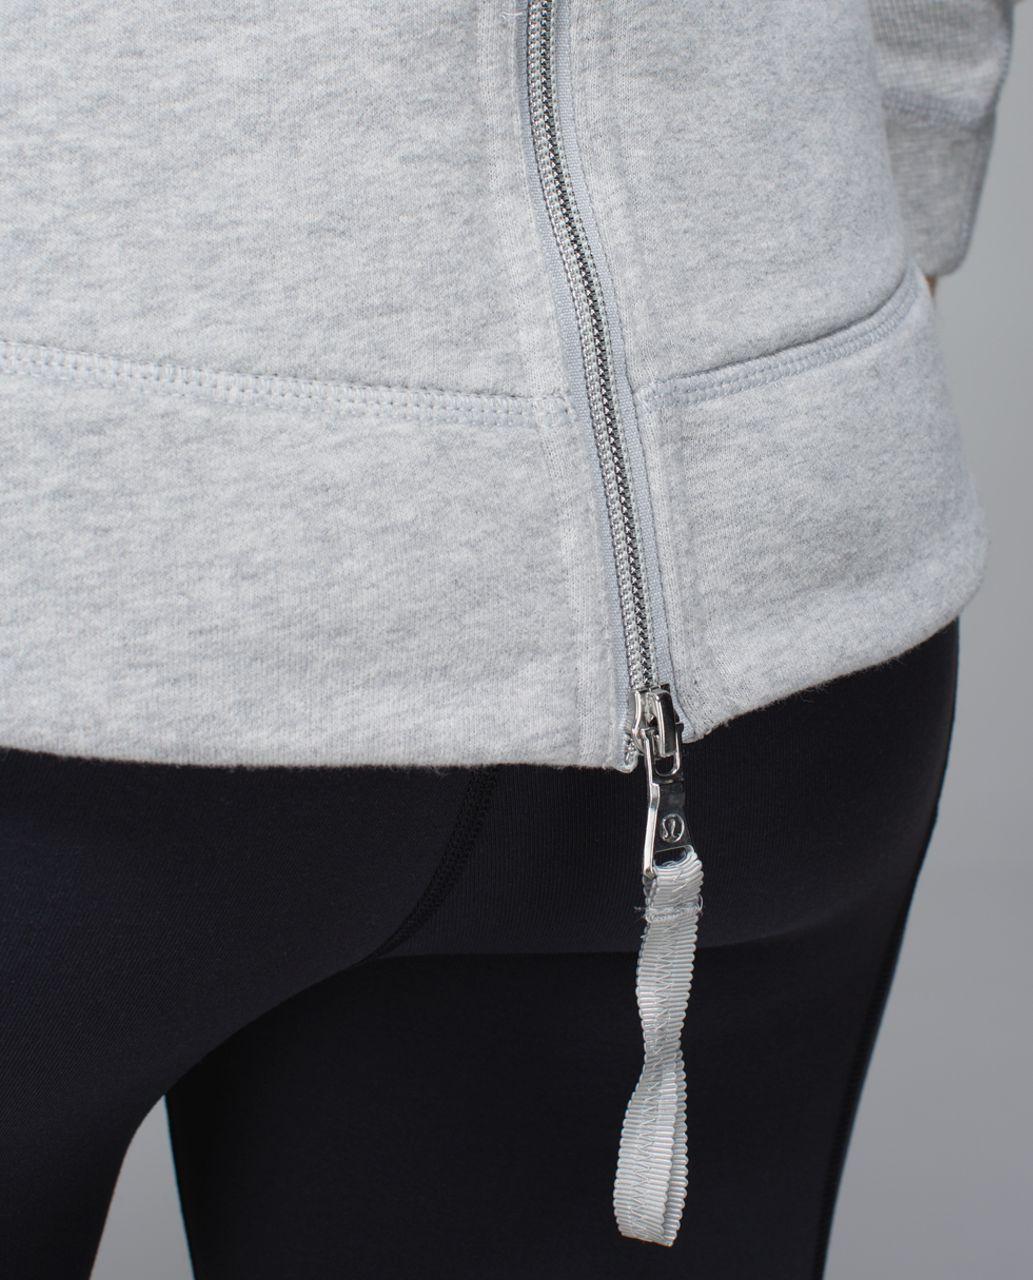 Lululemon En Route Jacket - Heathered Light Grey / Soot Light / Silver Spoon / Heathered Light Grey